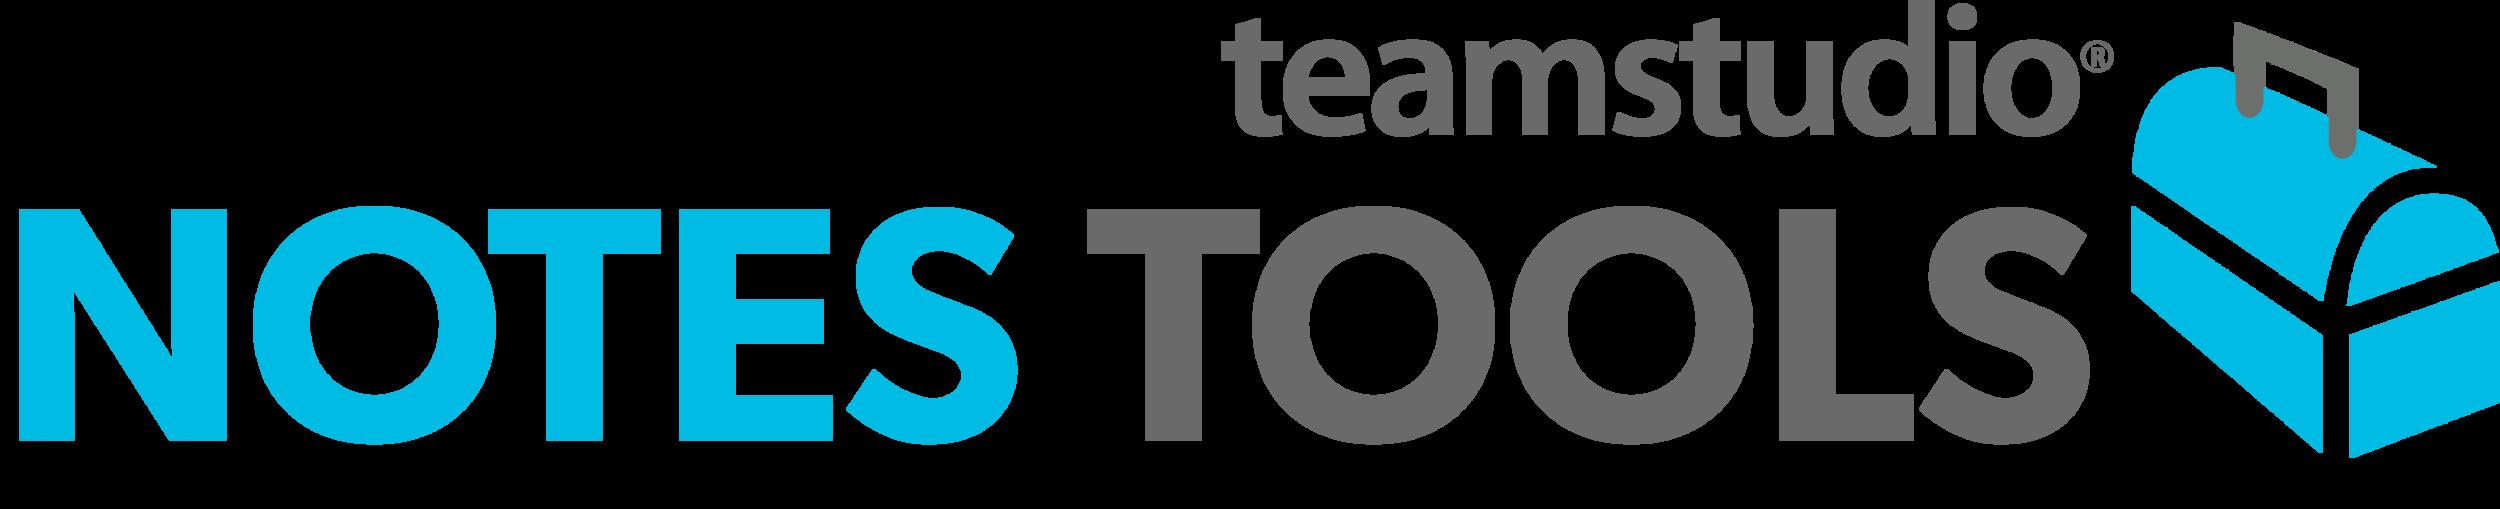 Notes Tools Logo.png